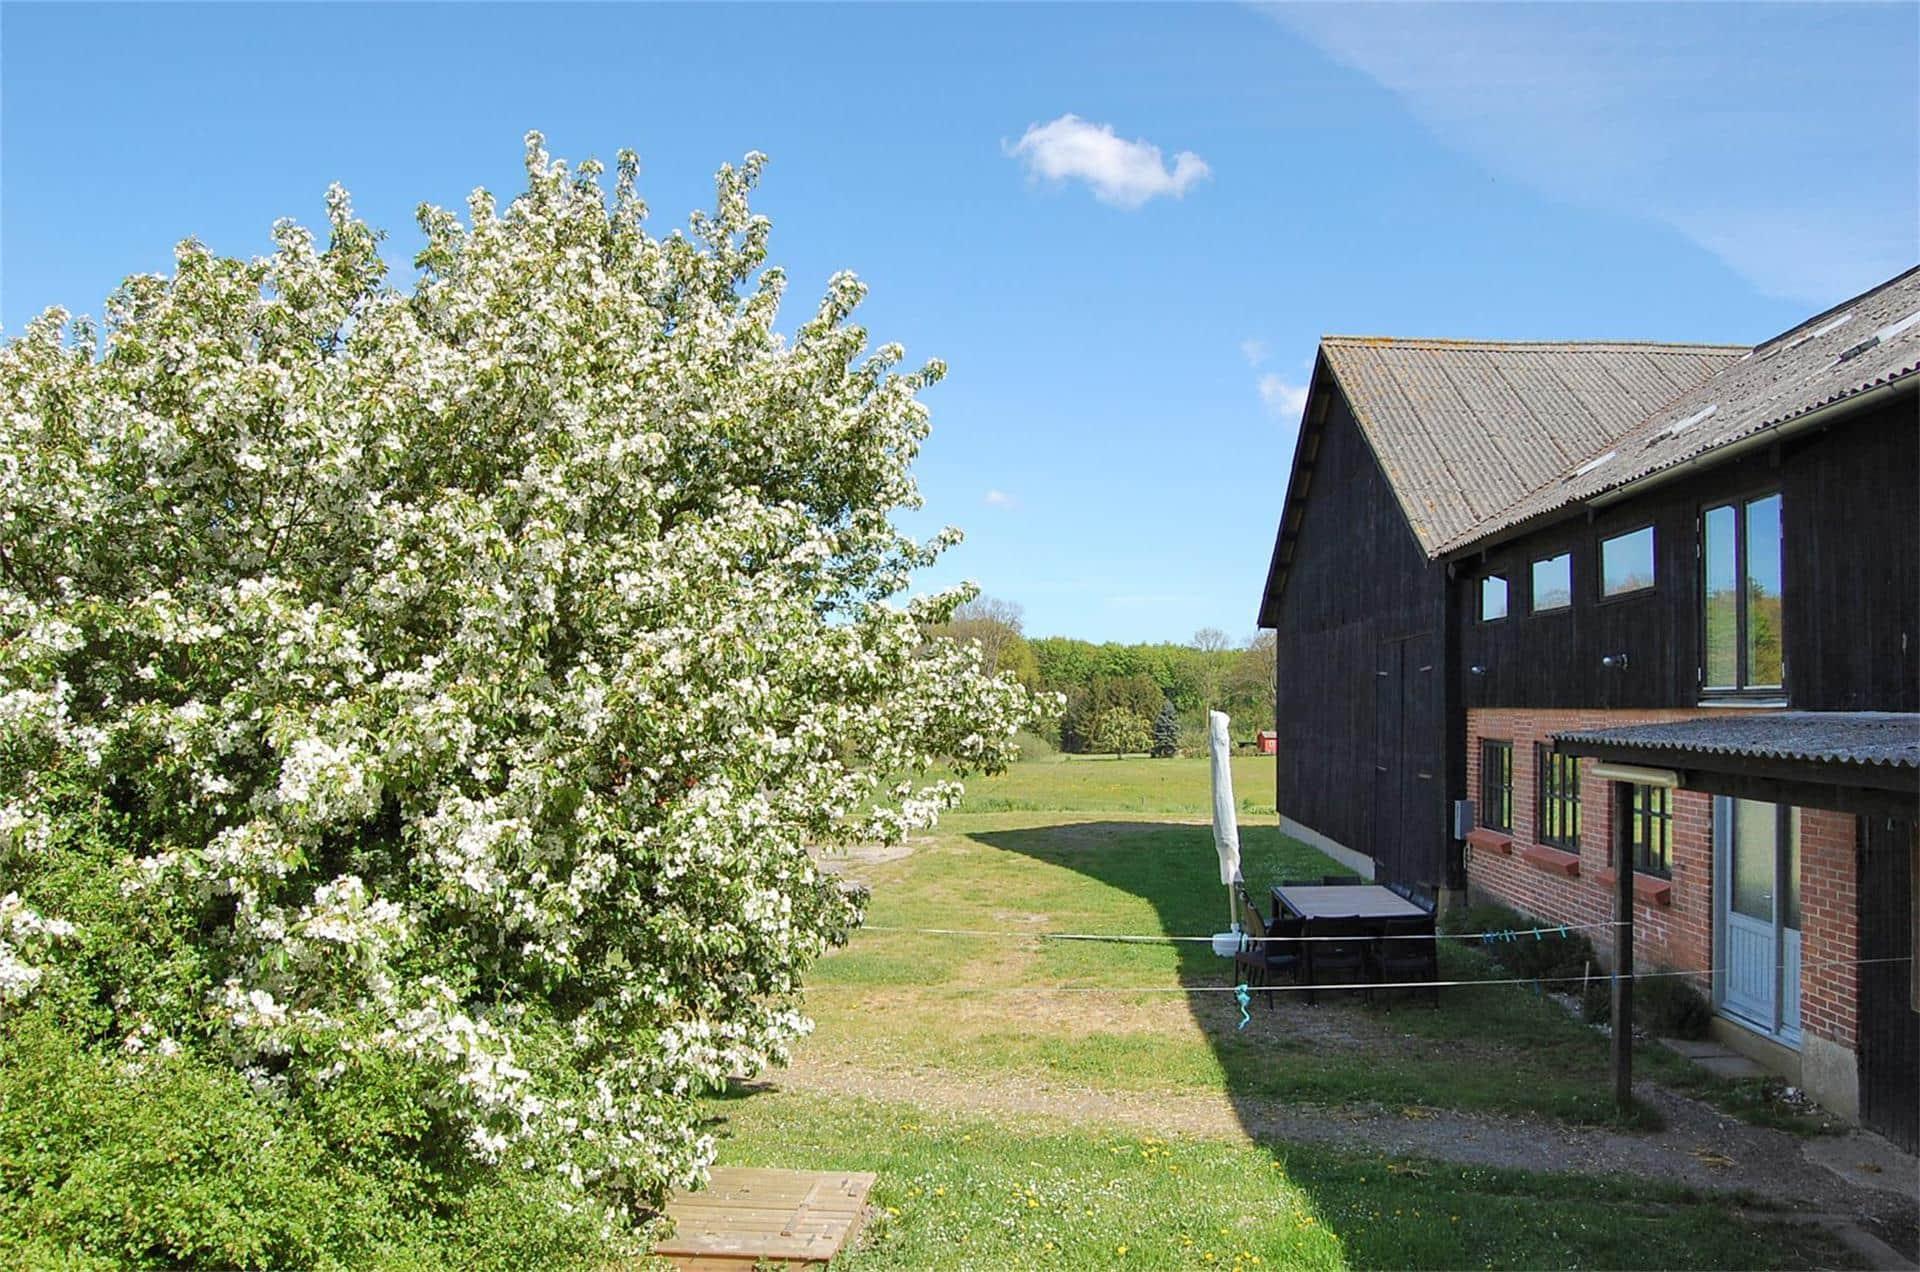 Billede 1-3 Sommerhus M66251, Svendborgvej 4, DK - 5800 Nyborg